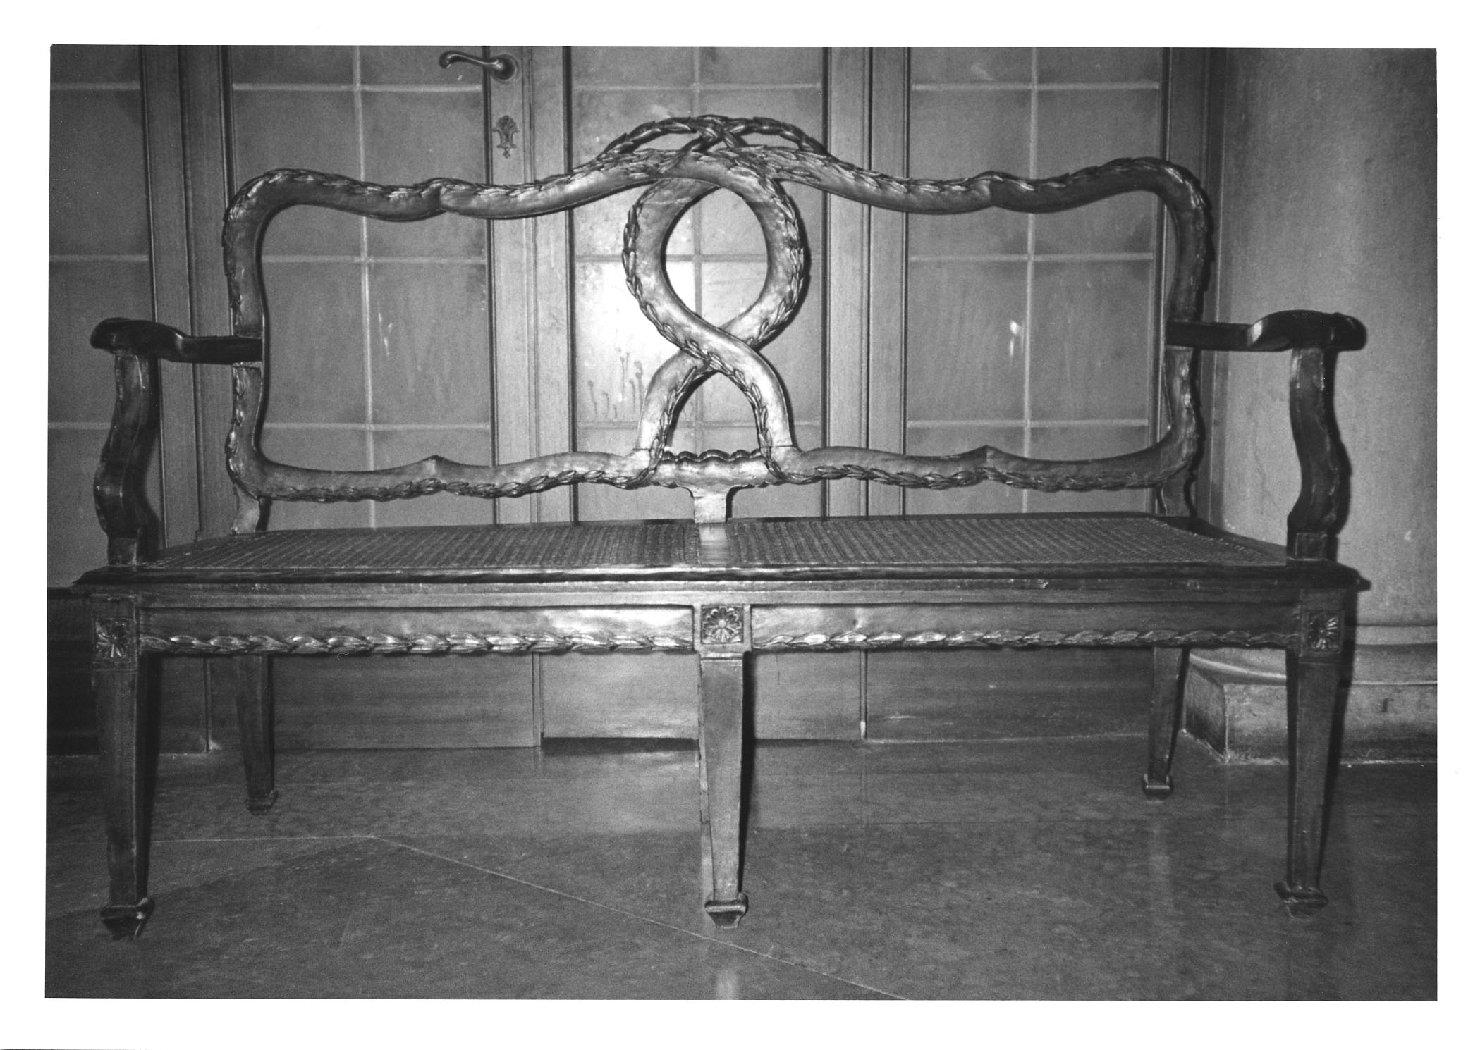 divano, opera isolata - manifattura veneta (prima metà sec. XX)